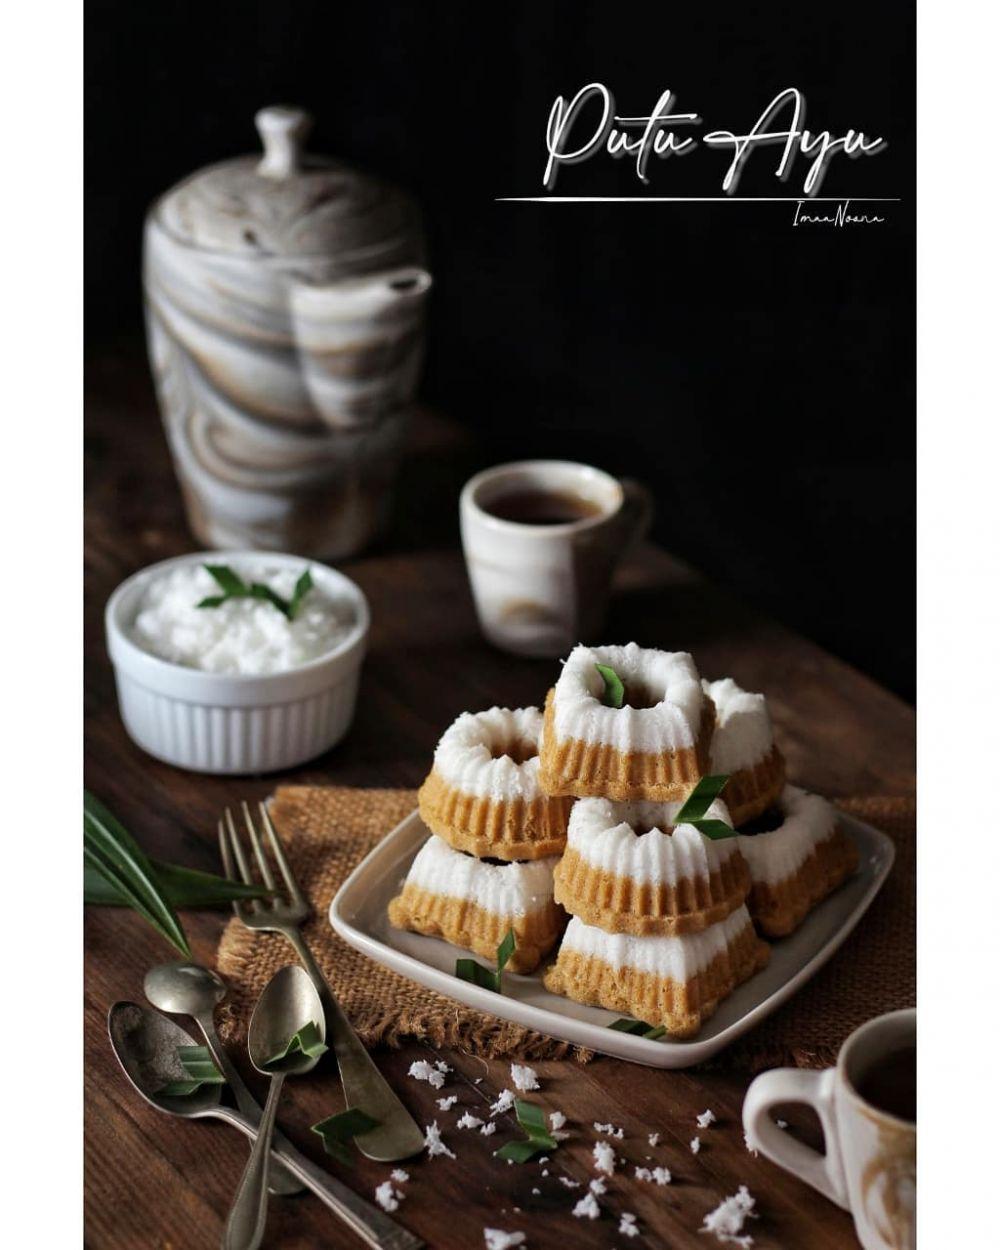 Resep kue putu ayu © 2021 brilio.net